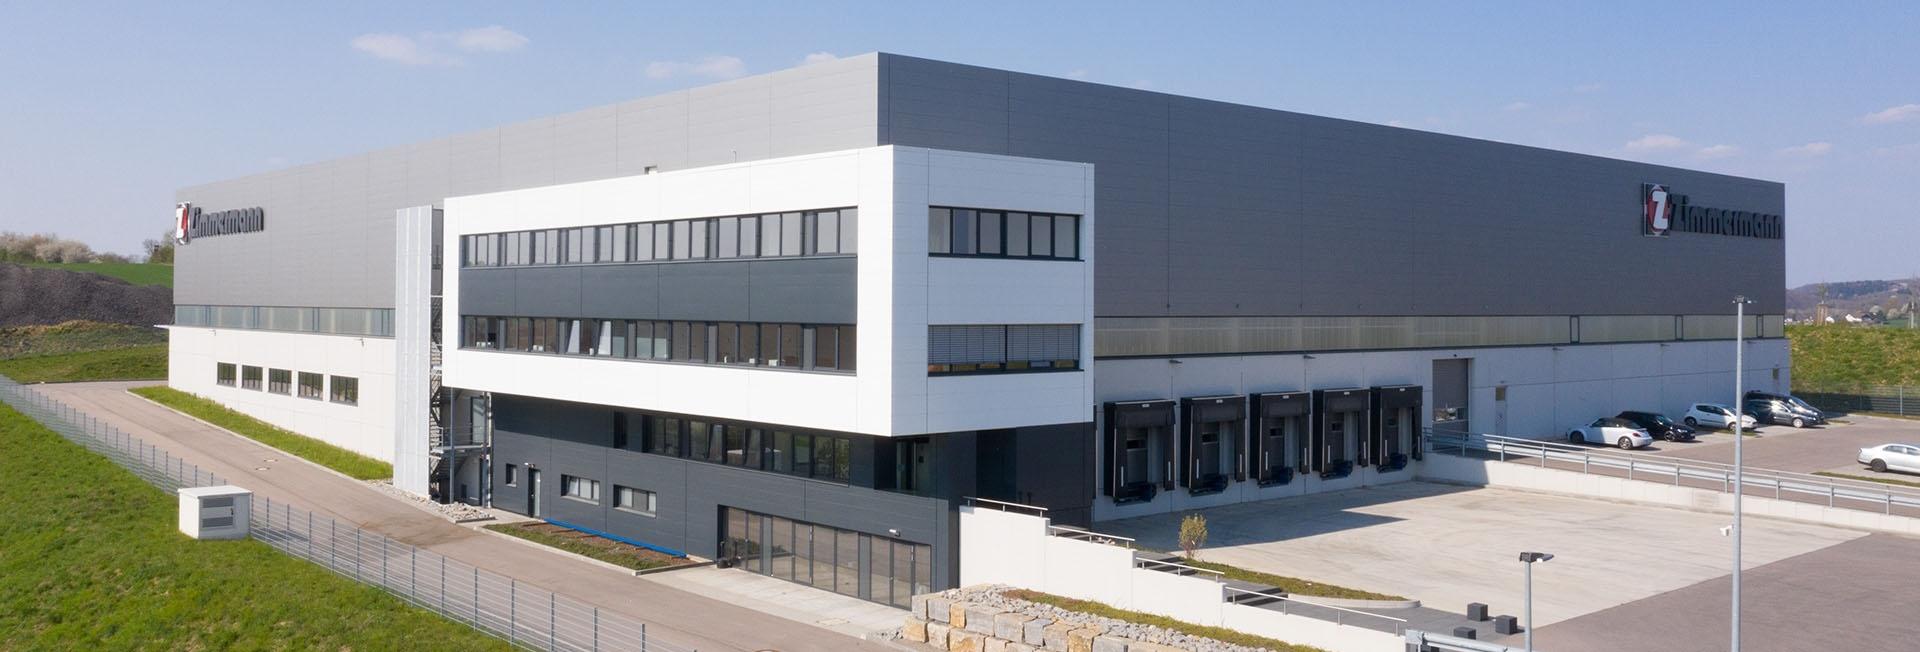 Zimmermann_Firmensitz_Logistik